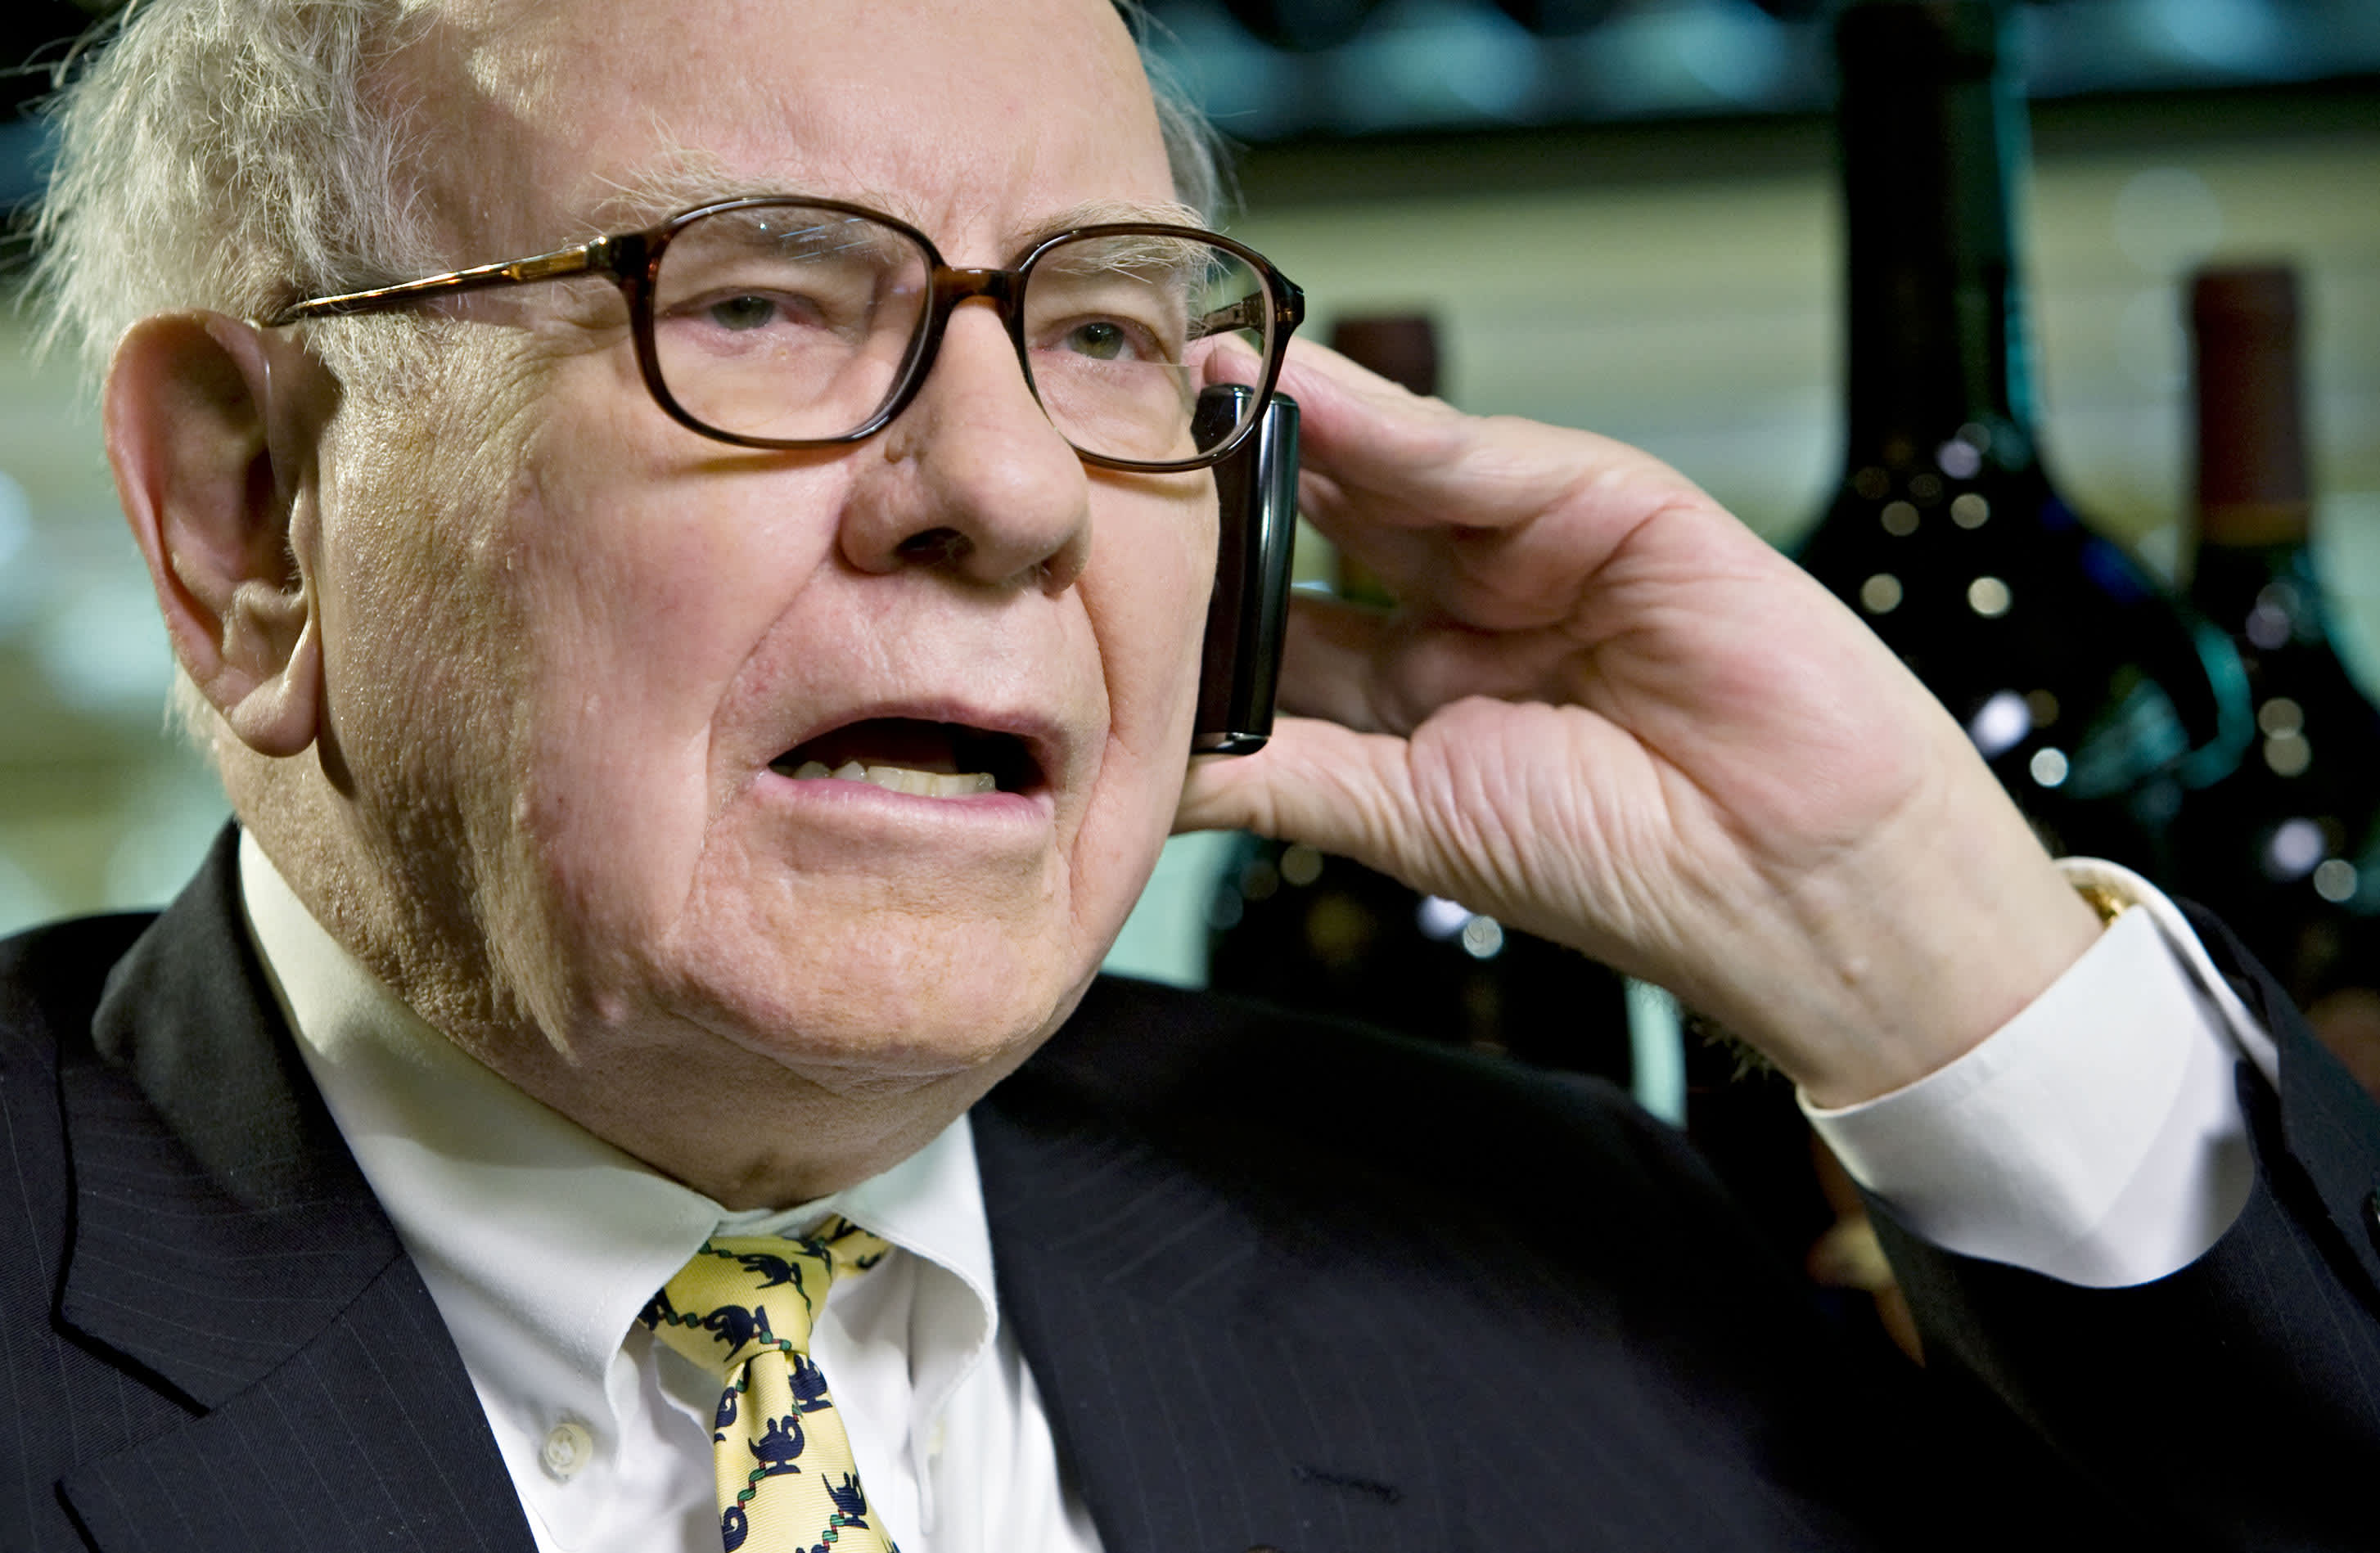 Billionaire investor Warren Buffett, chairman of Berkshire Hathaway, speaks on a mobile phone during an interview in New York, U.S., on Wednesday, June 25, 2008.